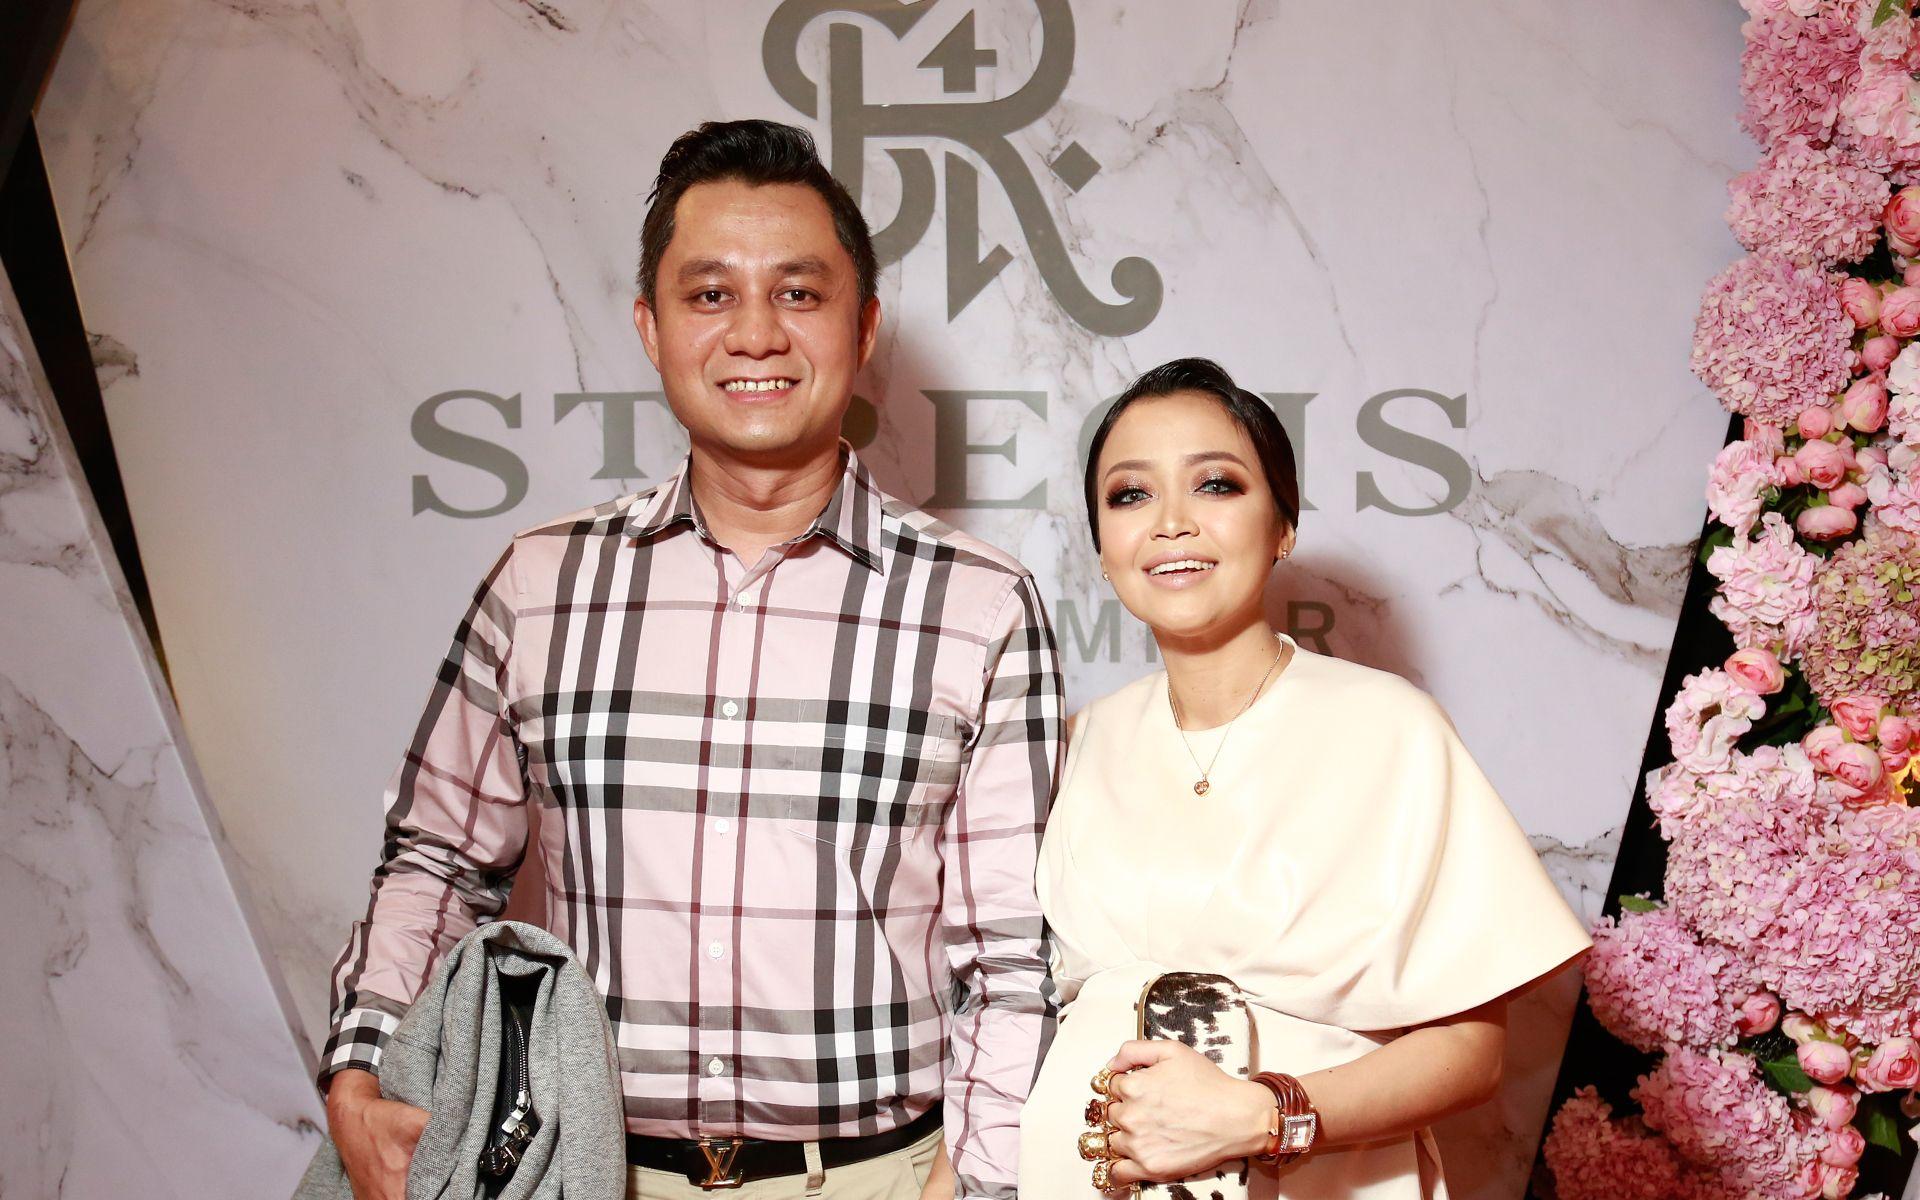 Shahriman Tan Sri Abdullah and Dato' Nadia Marni Shahriman